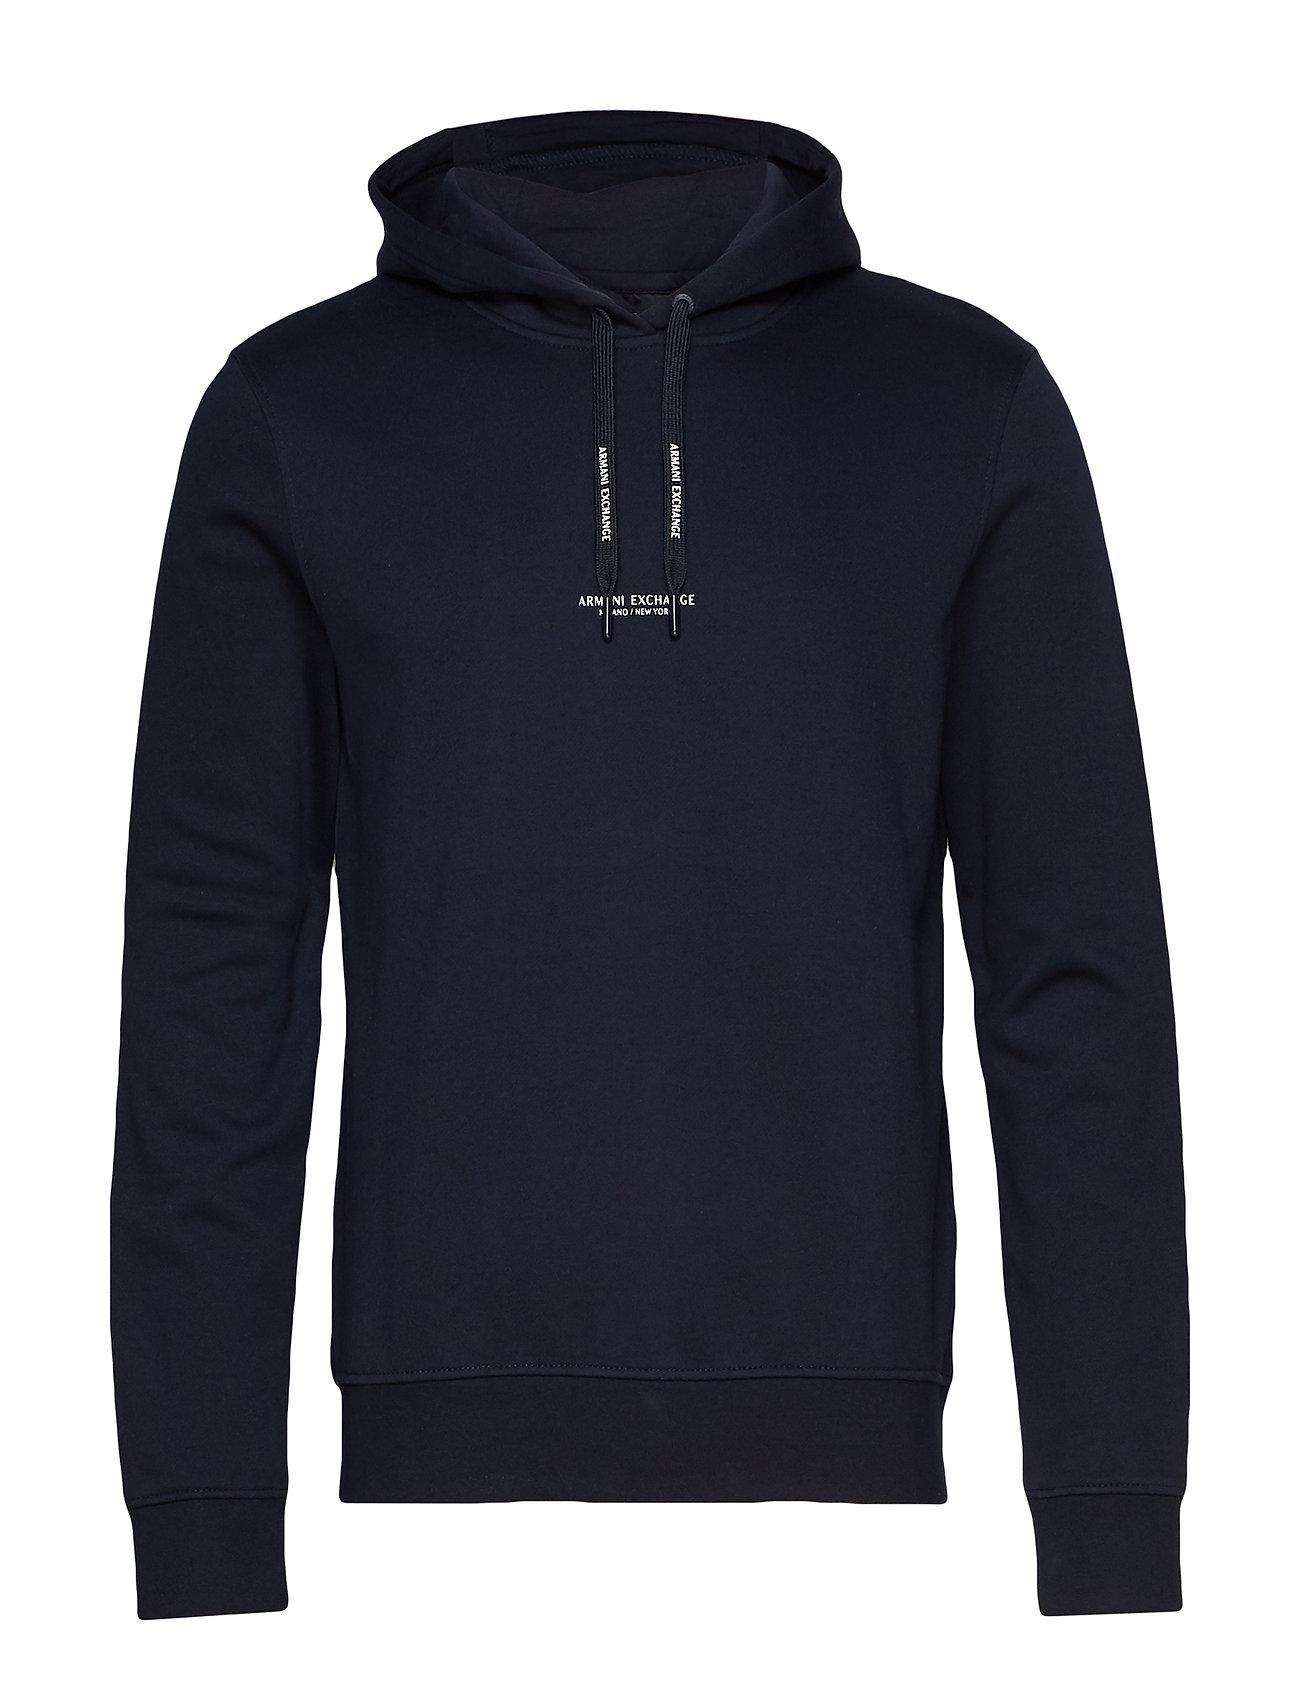 2bed3984 Ax Man Sweatshirt (Navy) (844 kr) - Armani Exchange - | Boozt.com